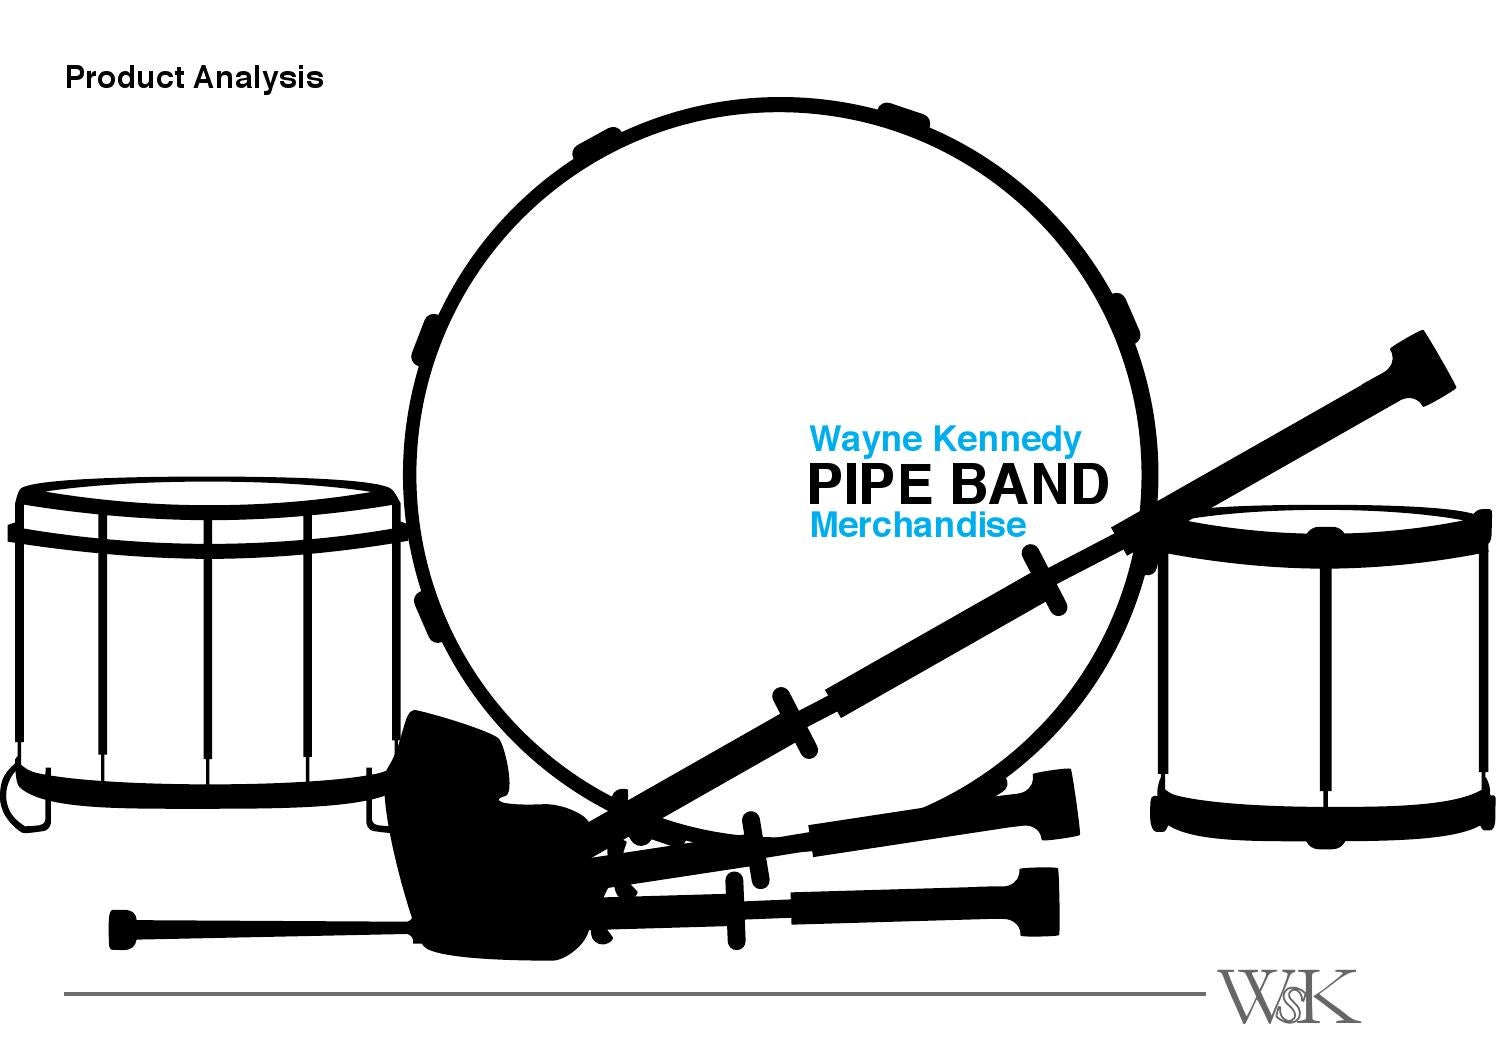 product analysis by wayne kennedy